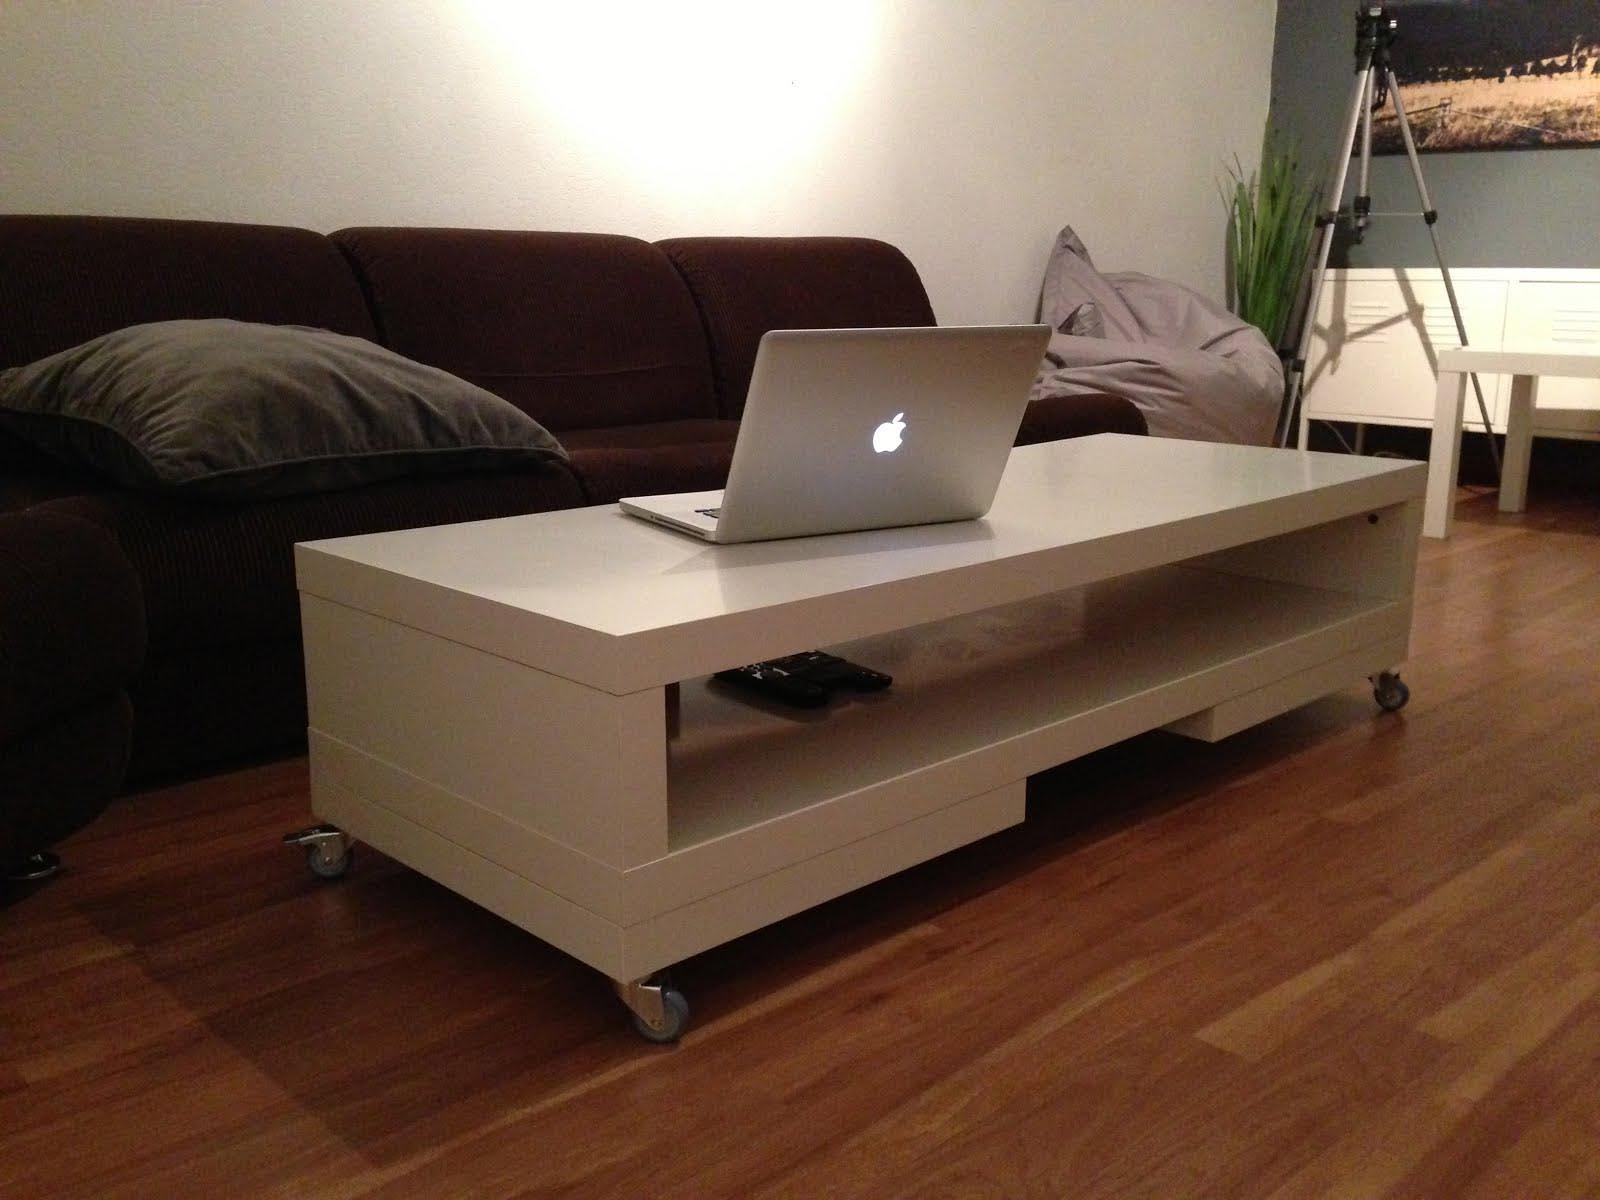 ikea sofa with wheels reversible coffee table design ideas